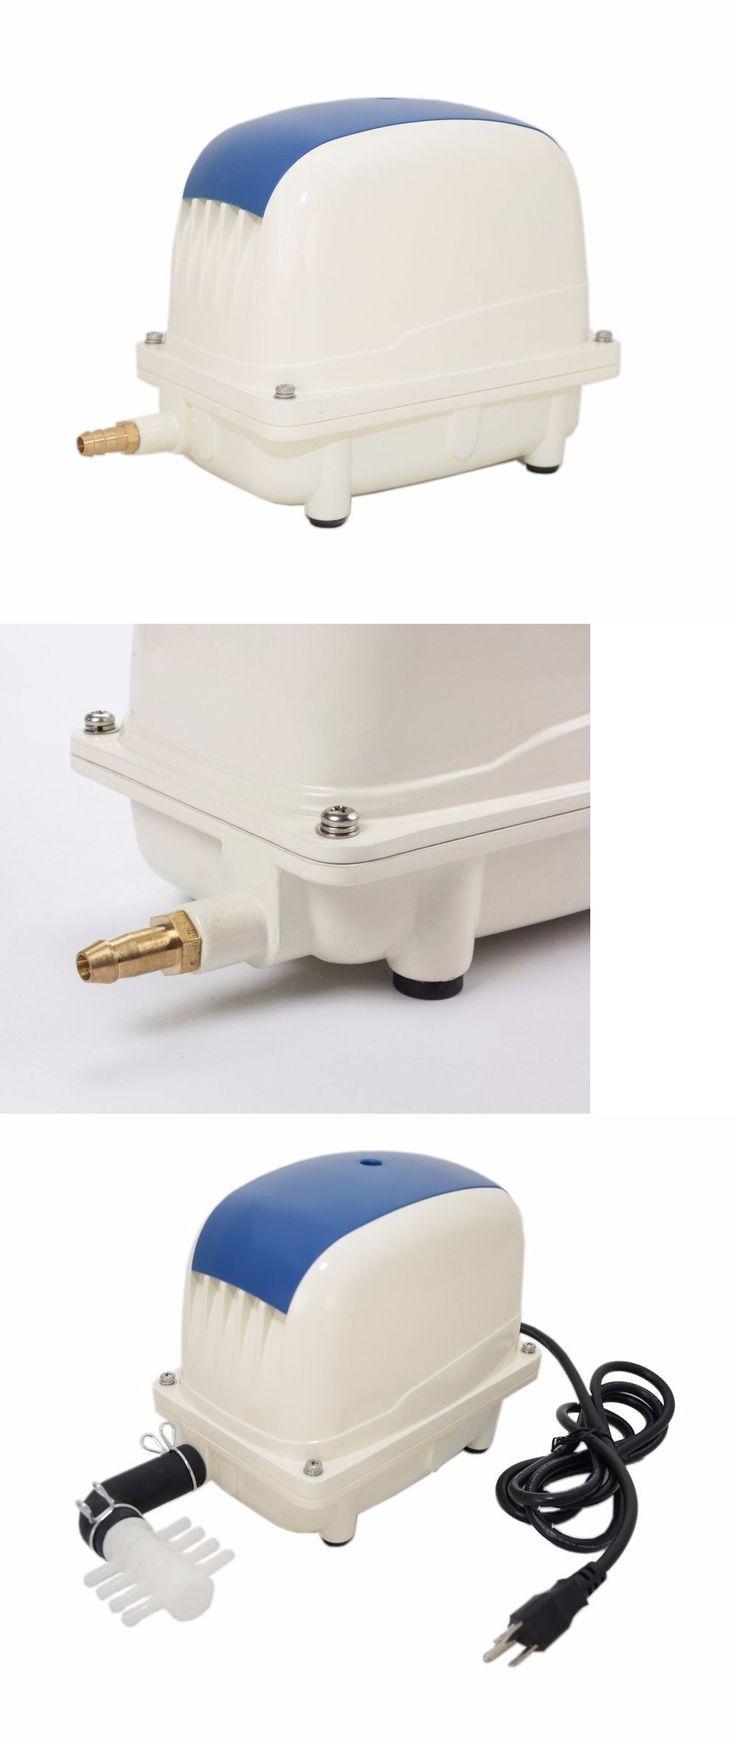 Jbj aquarium fish tank siphon gravel vacuum cleaner - Pumps Air 100351 Jecod Pa 200 200l Min Air Pump Indoor Aquarium Fish Tank